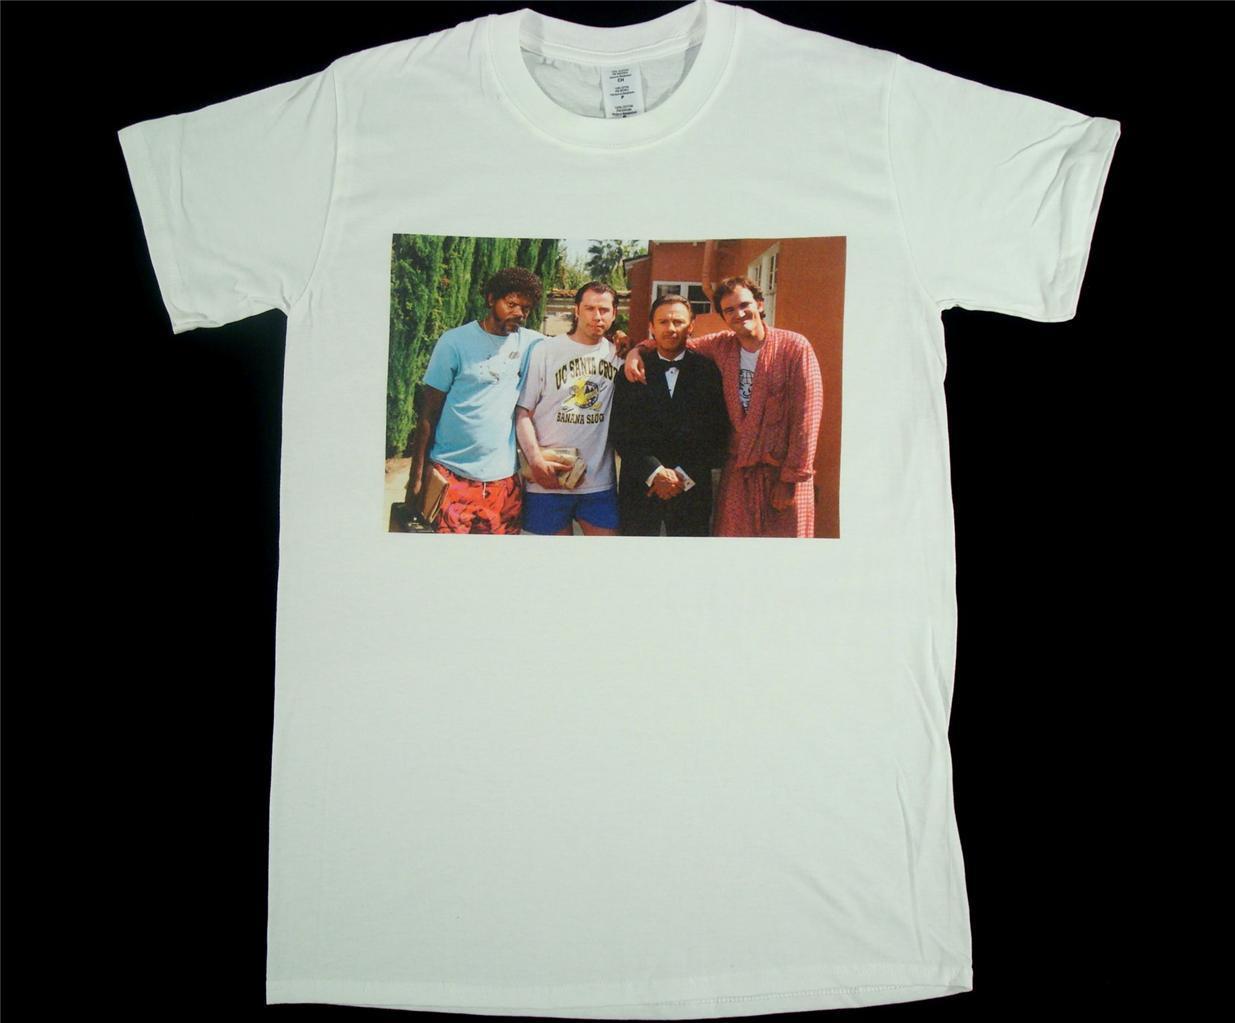 pulp-fiction-quentin-font-b-tarantino-b-font-travolta-iconic-retro-white-men-t-shirt-2018-summer-100-cotton